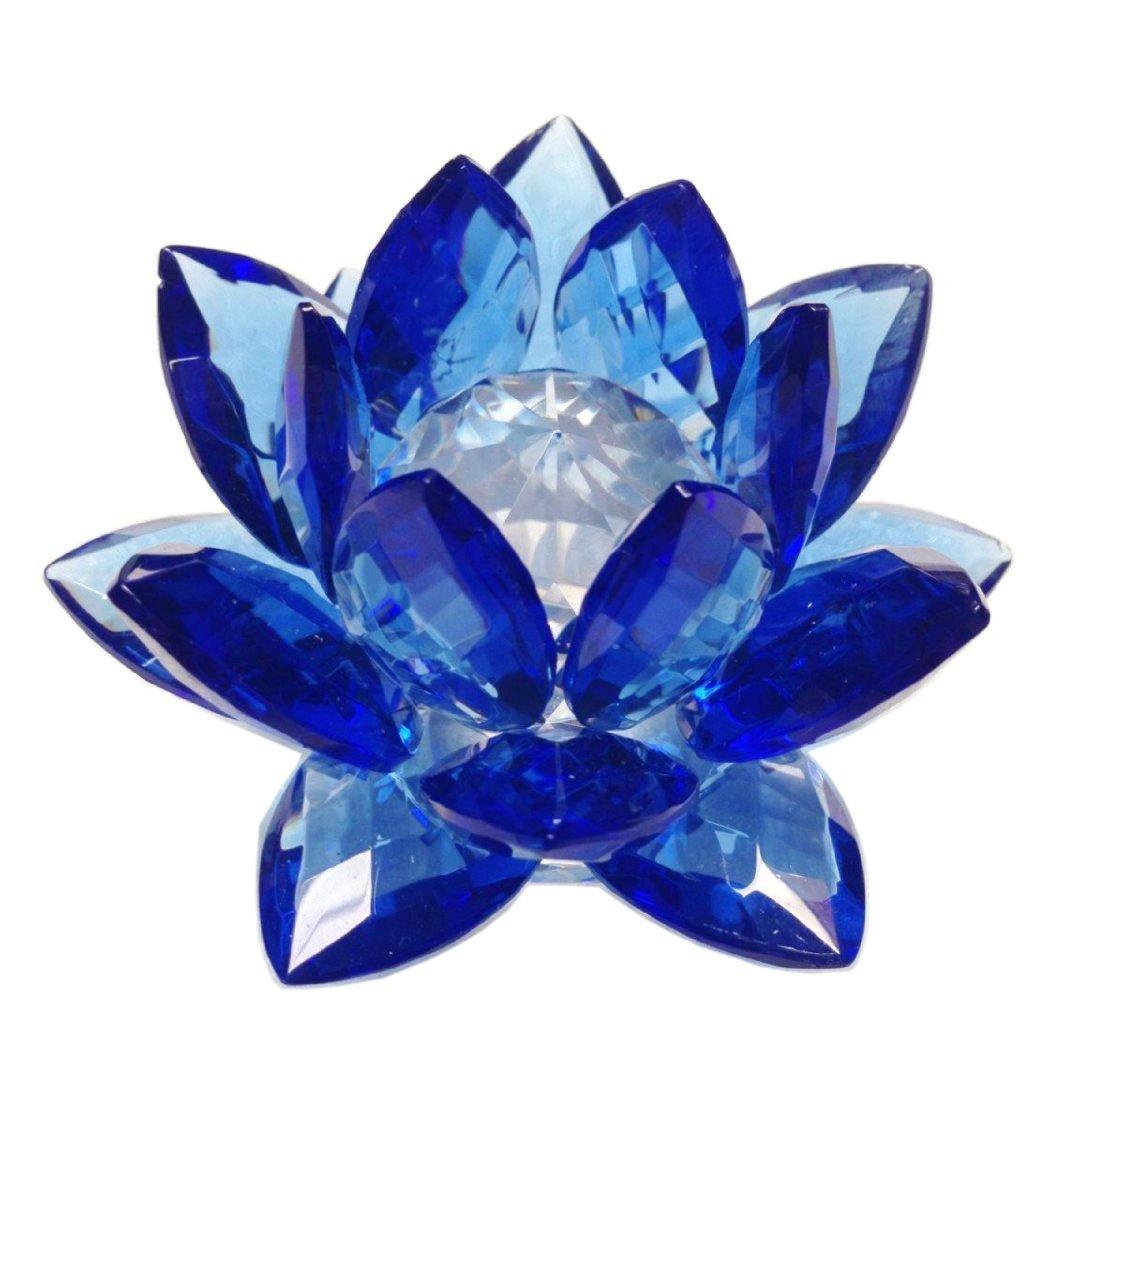 Amazon Amlong Crystal 3 Inch Sapphire Blue Crystal Lotus Flower